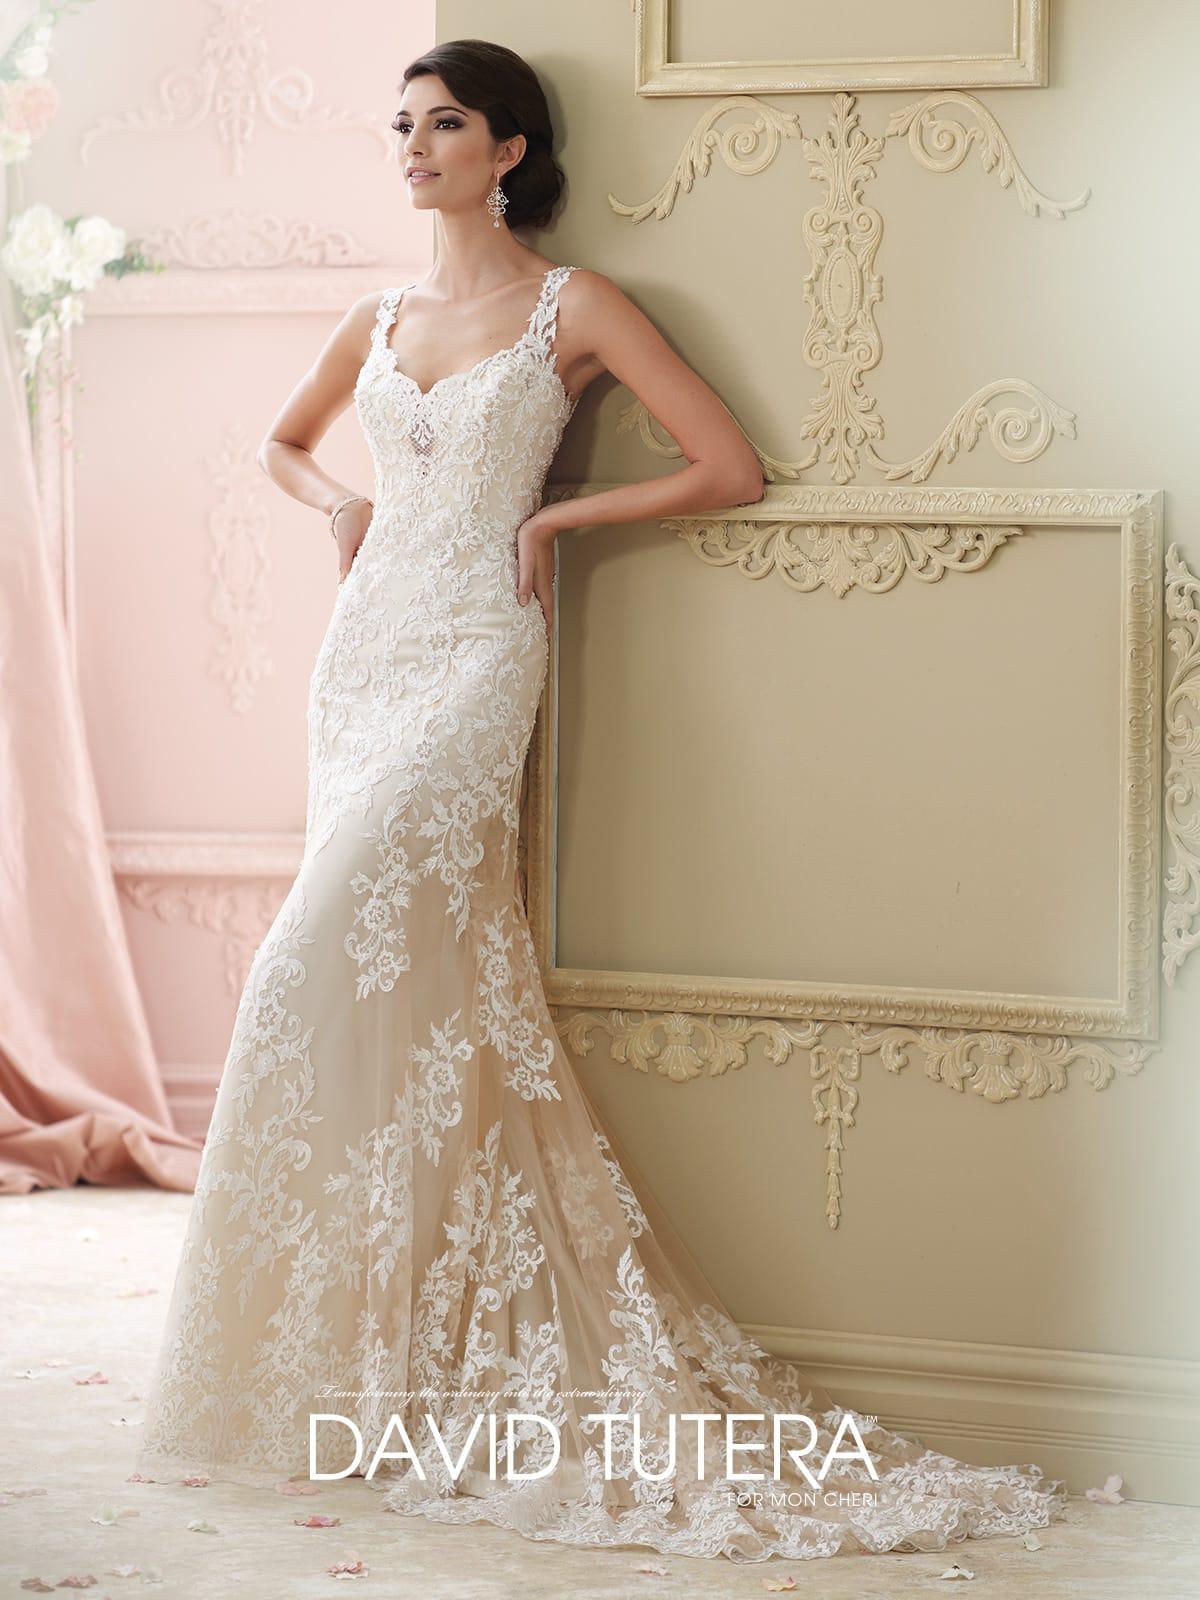 Mon cheri david tutera13 Mon Cheri Destination Wedding Dresses You Need To See Right Now  . Mon Cheri Wedding Dresses. Home Design Ideas